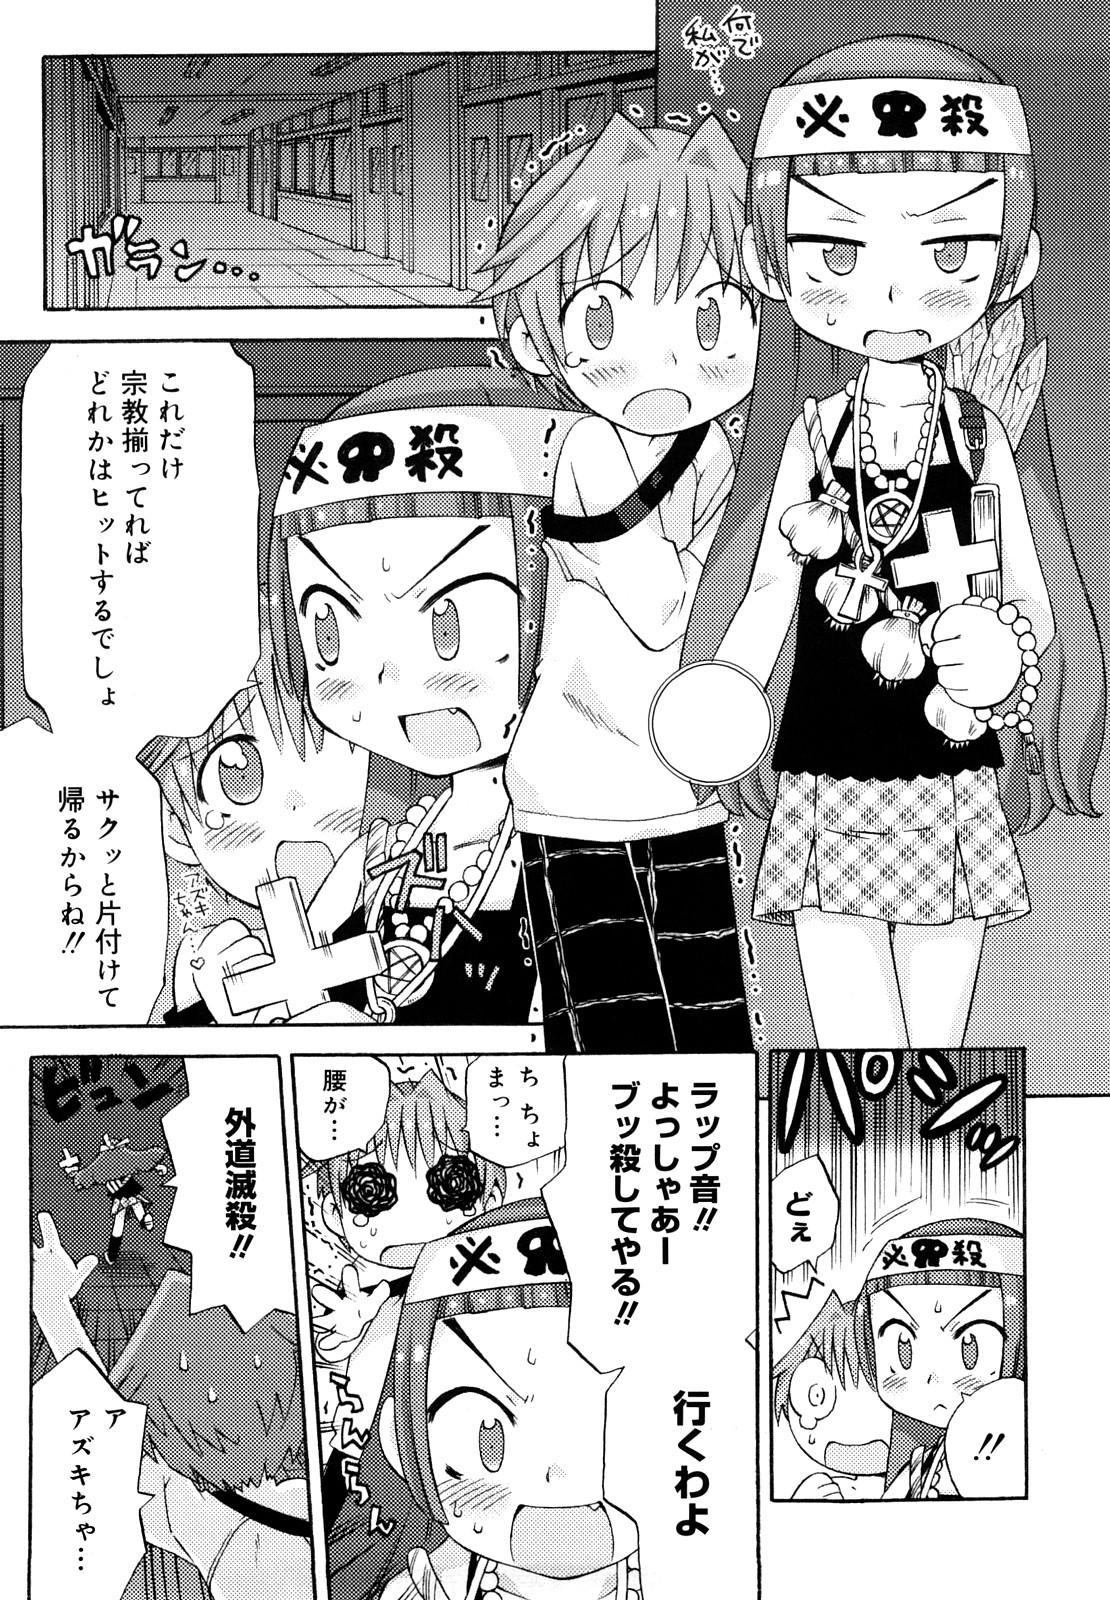 Hatsuden Pandakun! Shinsouban 32